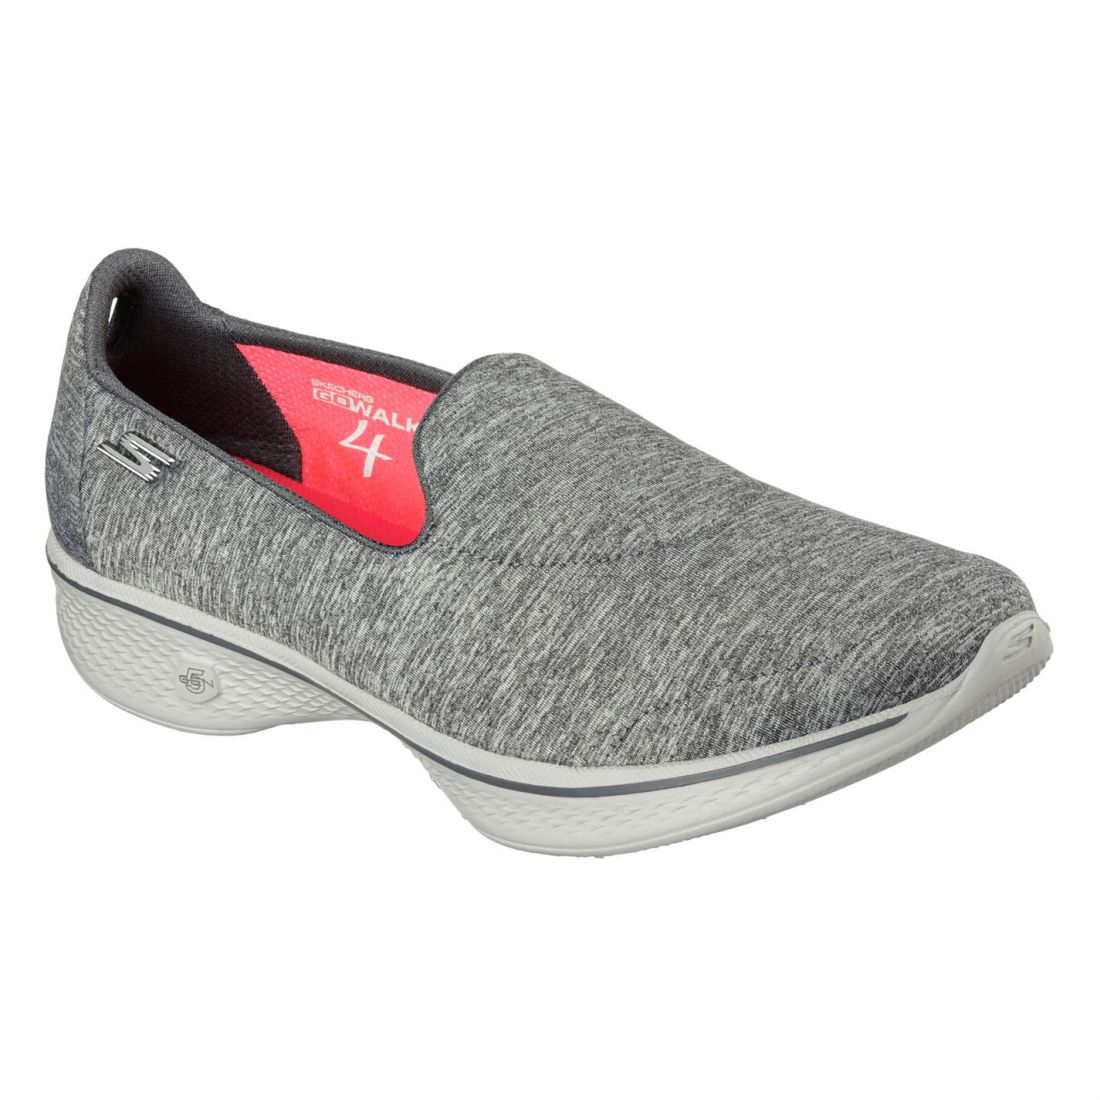 Achiever Jersey Zapatillas Skechers Zapatillas damas 4 anttimicrobianas para Gowalk gris Heather SWUBqpw